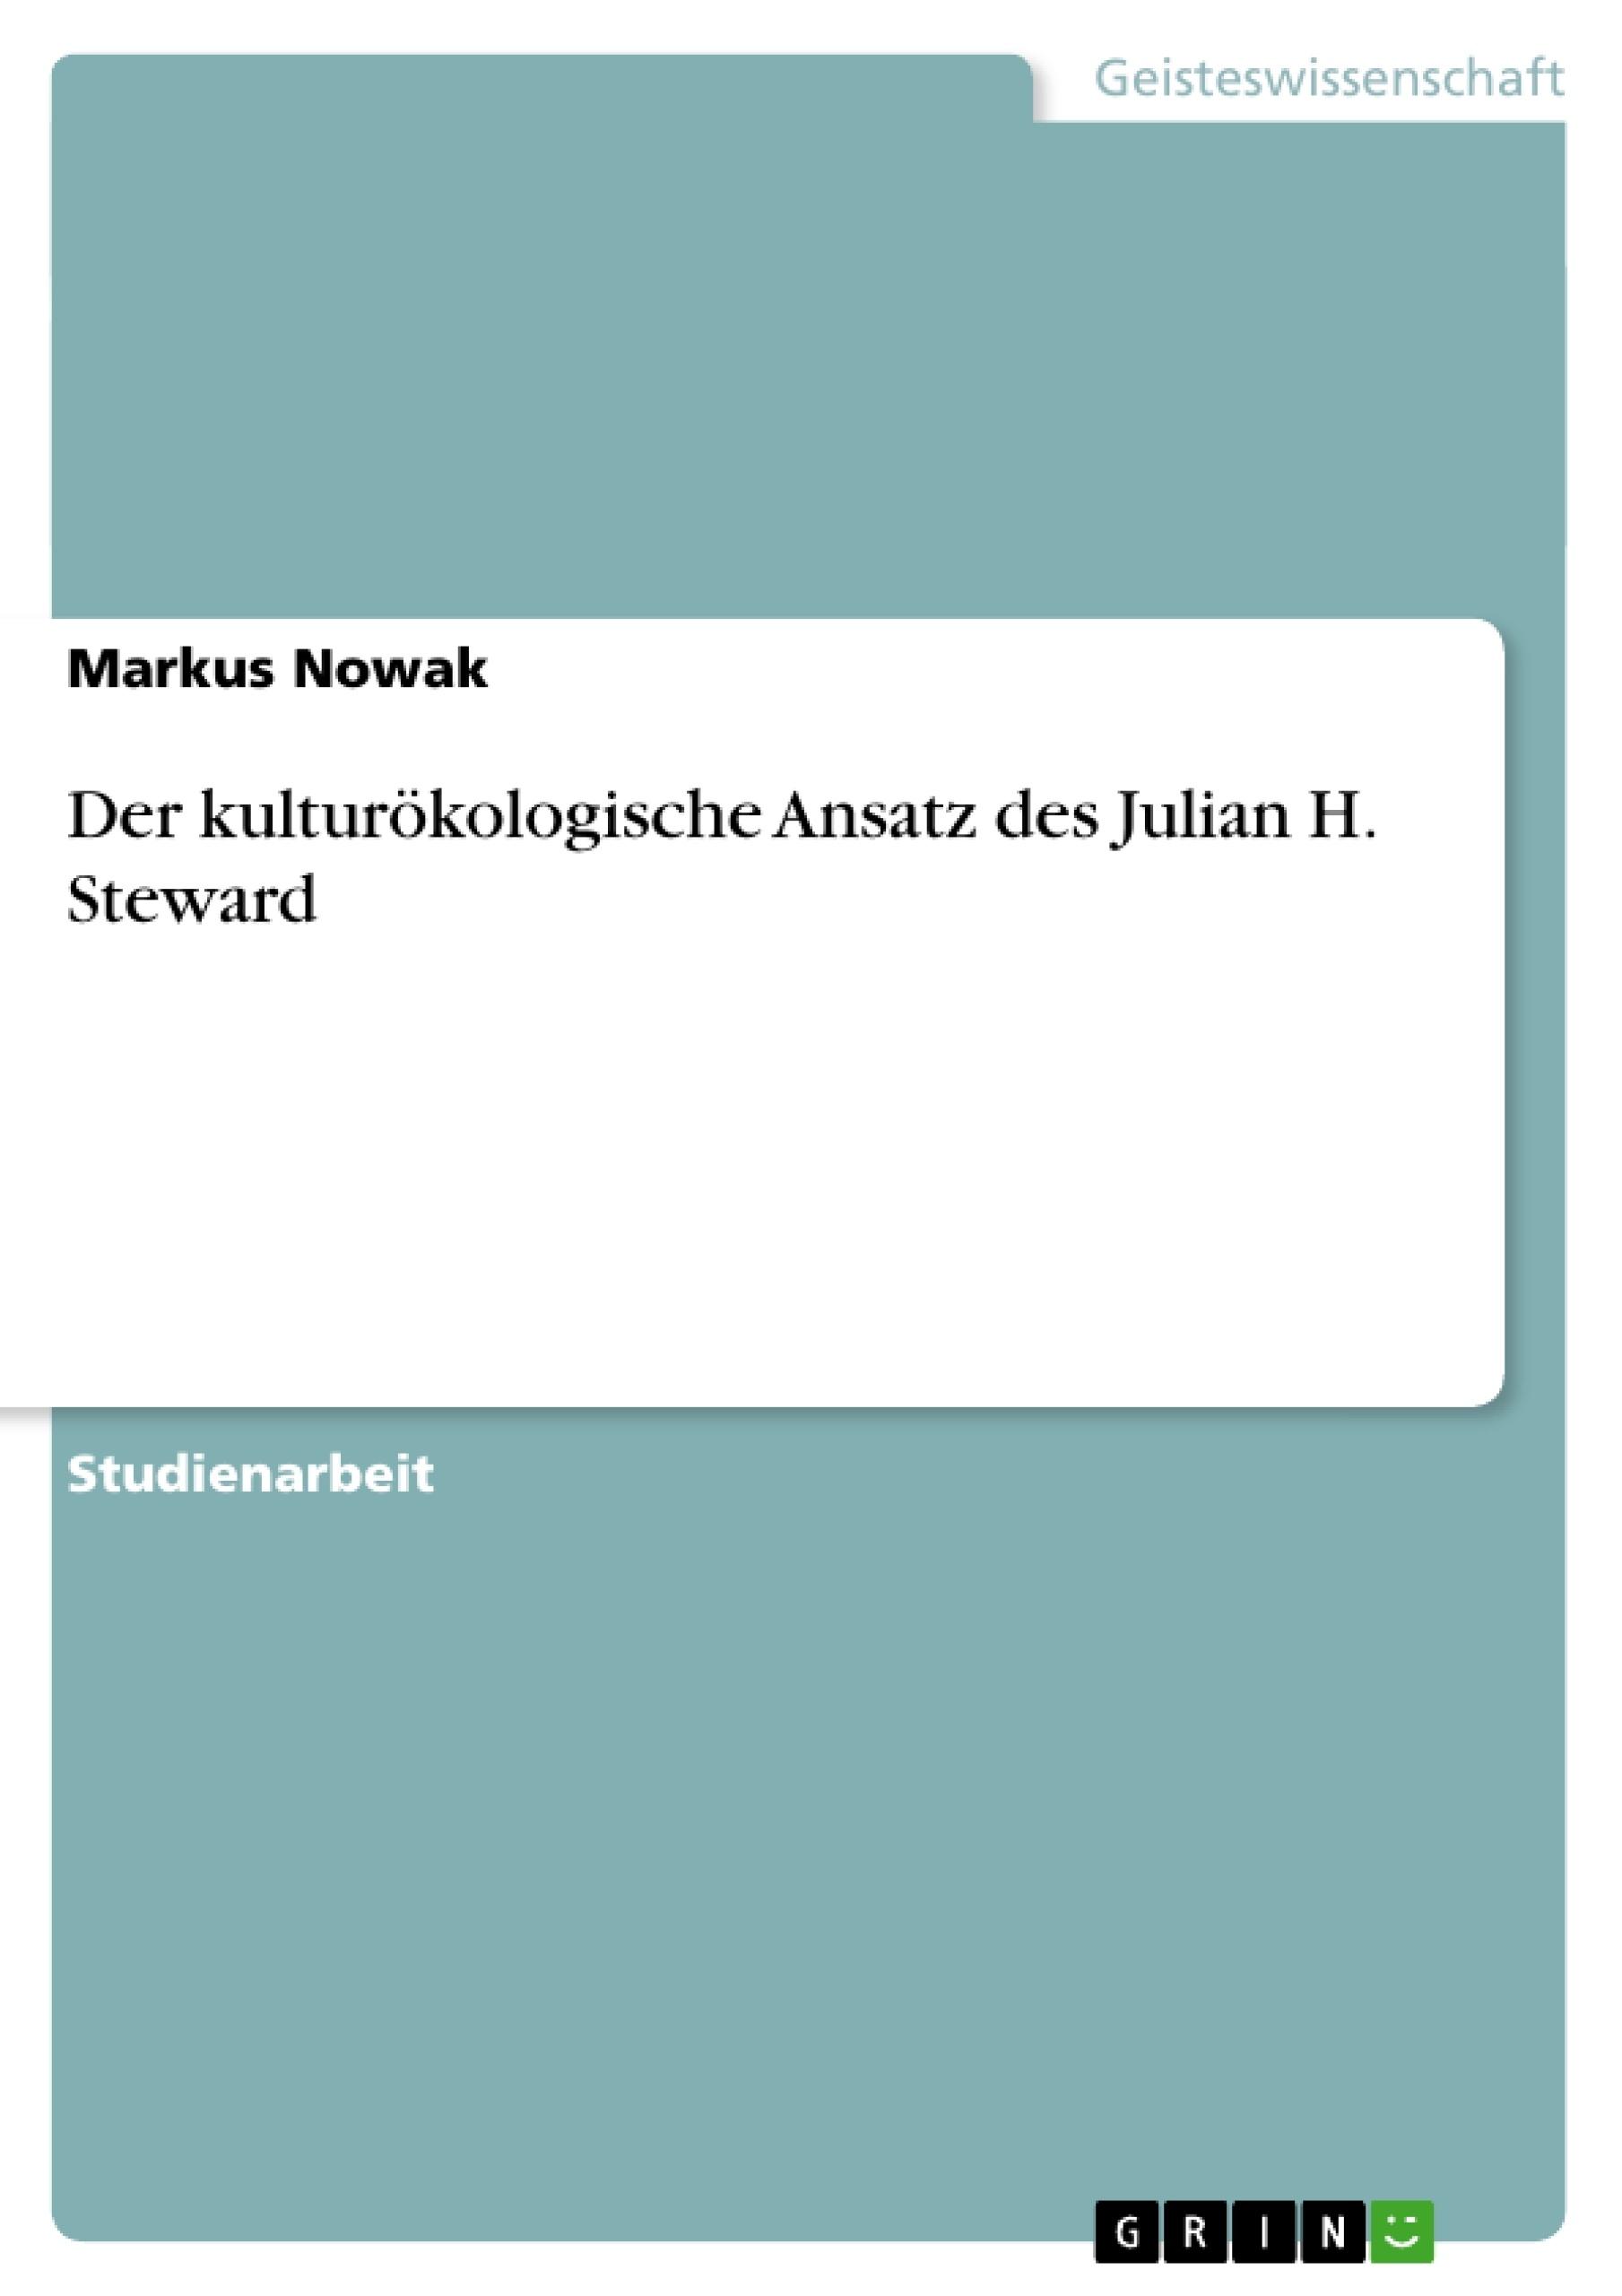 Titel: Der kulturökologische Ansatz des Julian H. Steward